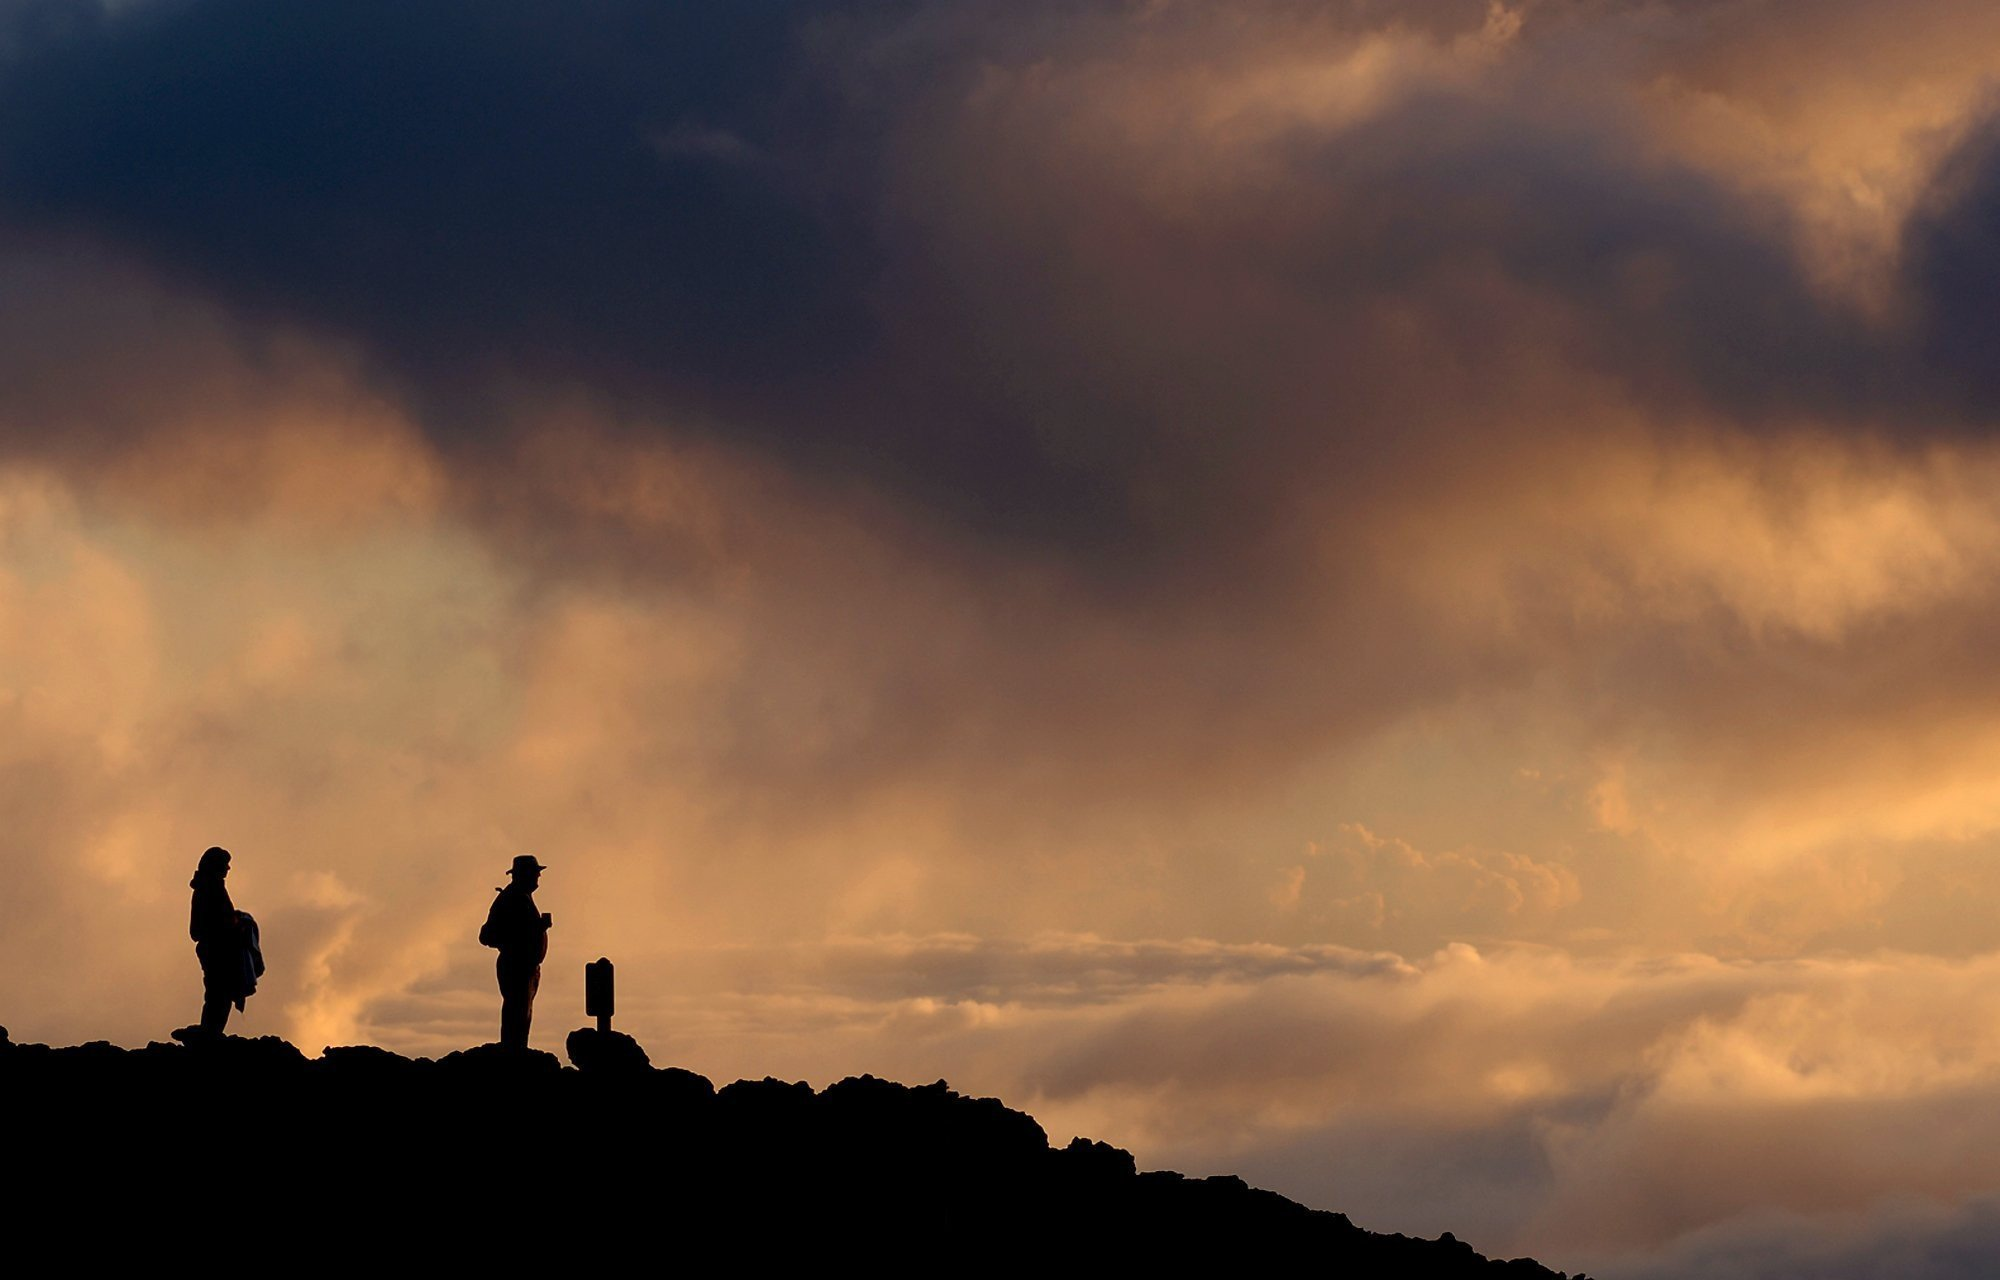 Visitors watch the sunrise atop Haleakala, a volcano rising 10,023 feet in Haleakala National Park on Maui.